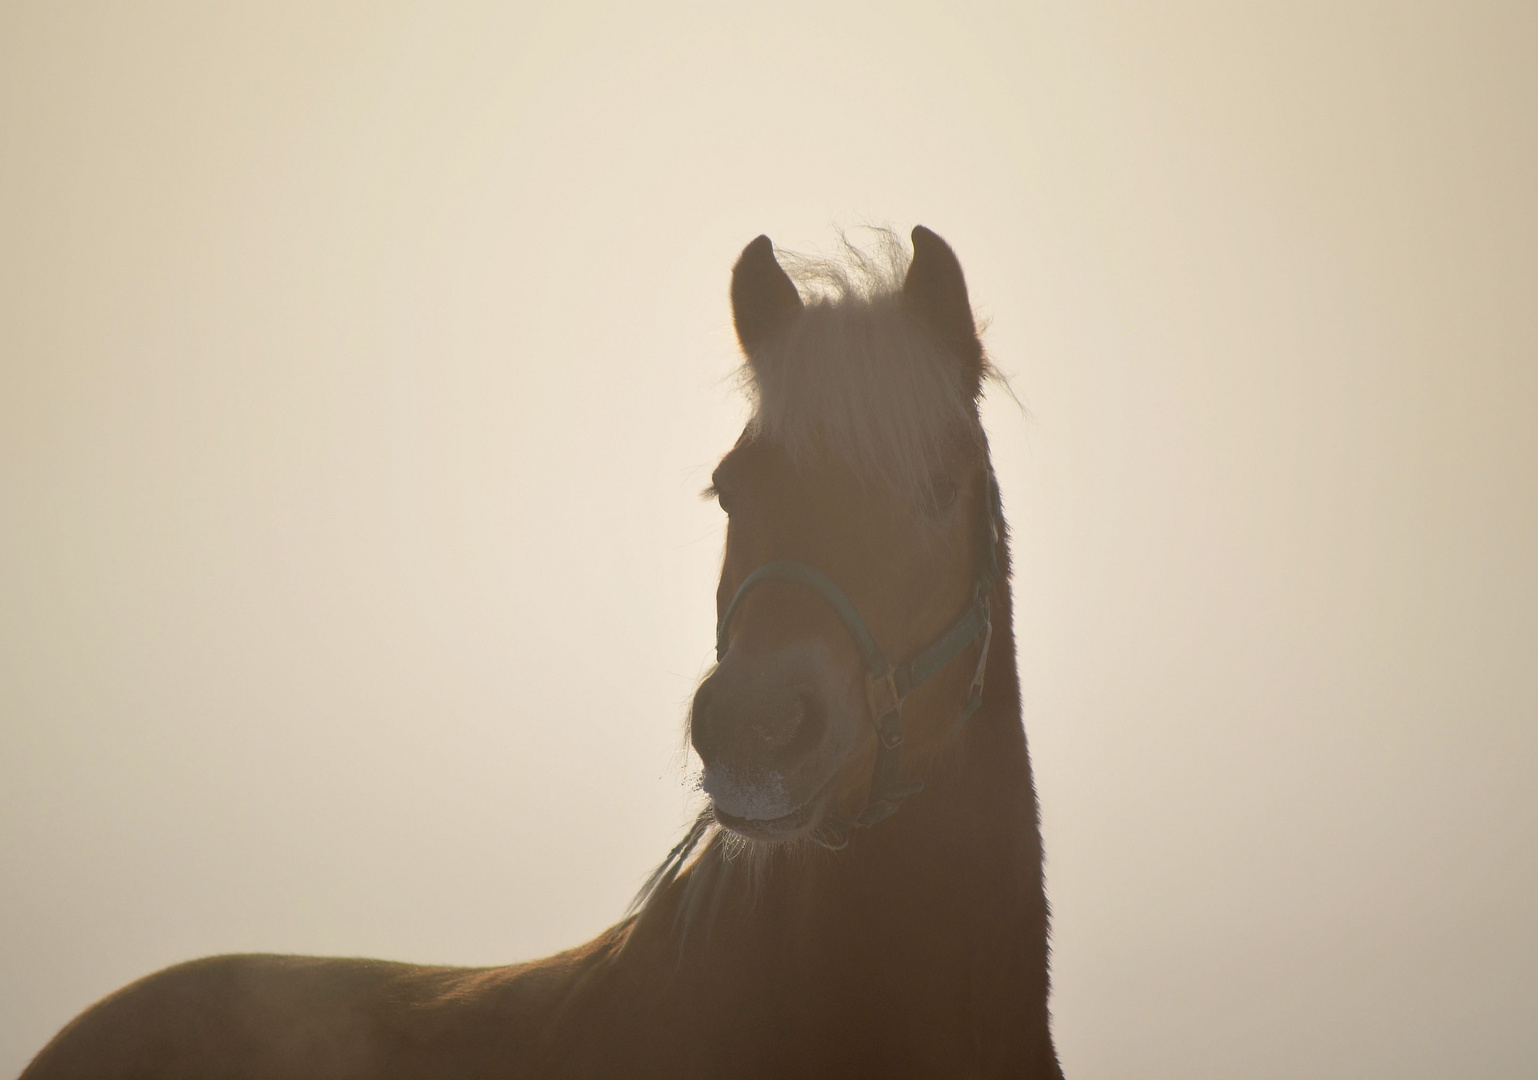 Nino im Morgennebel